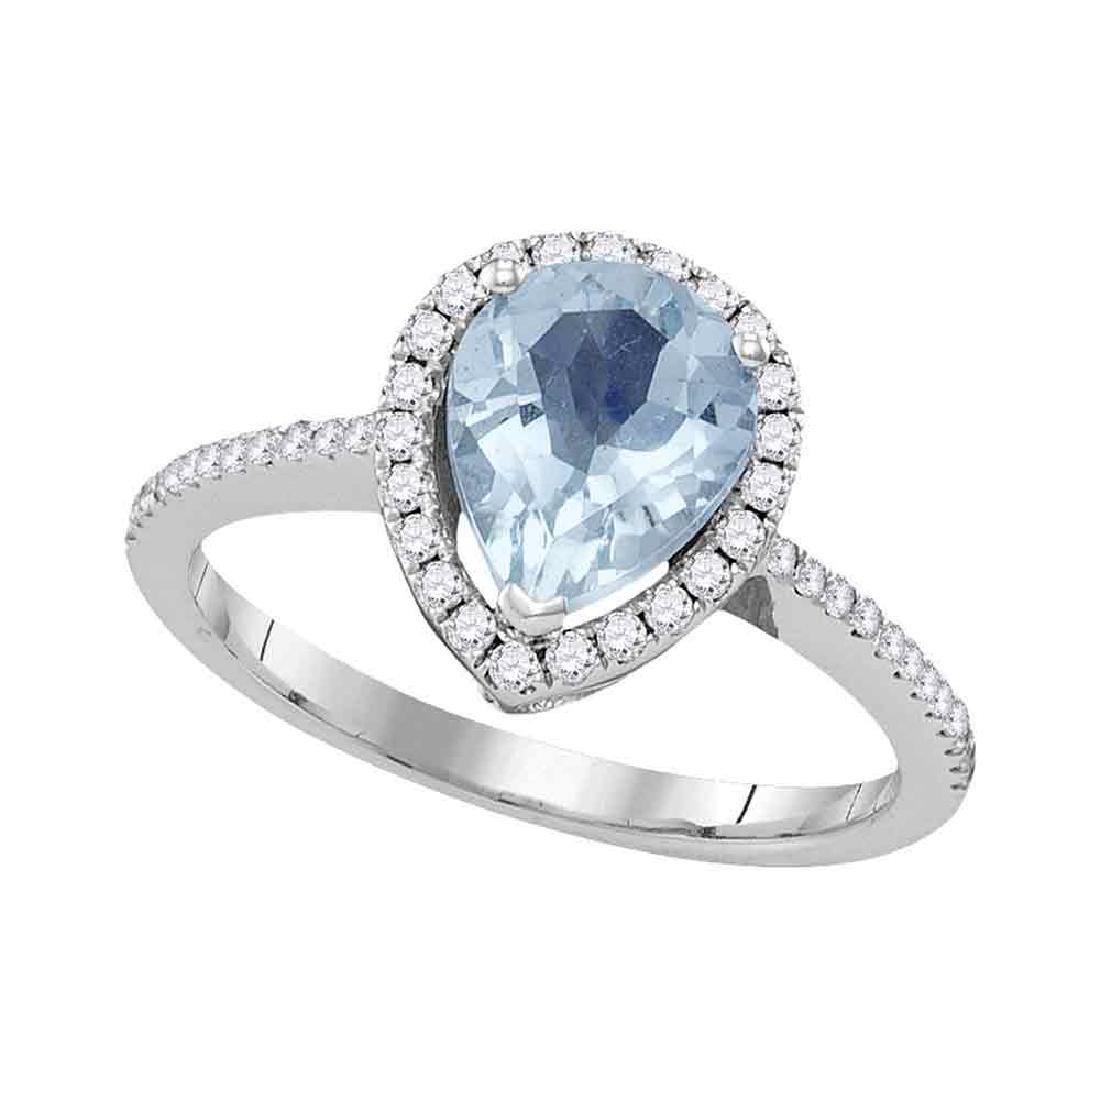 1.45 CTW Pear Aquamarine Solitaire Diamond Teardrop